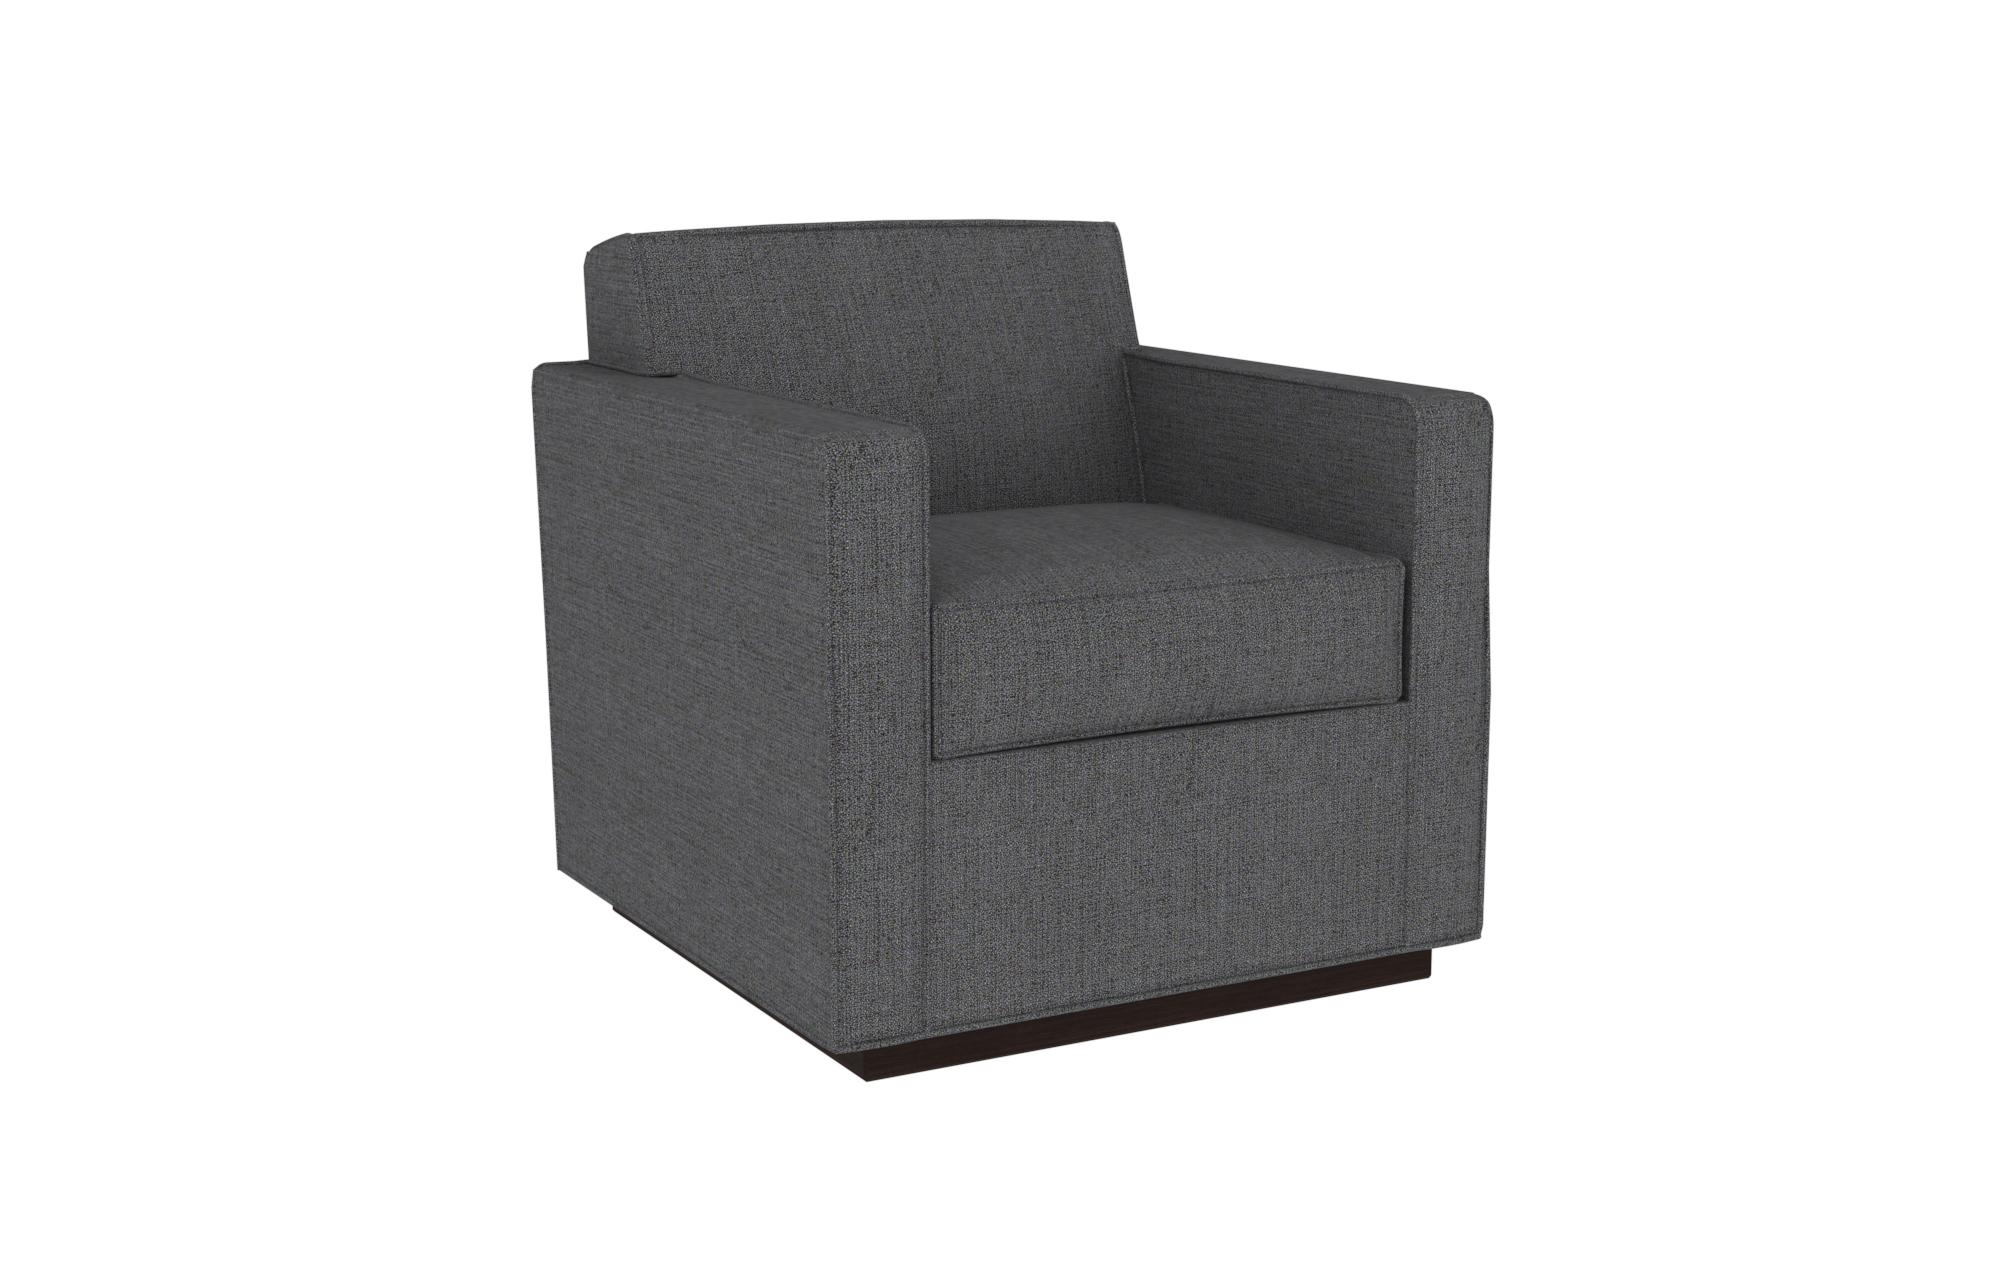 Hickory Contract Tuxedo Lounge 5010